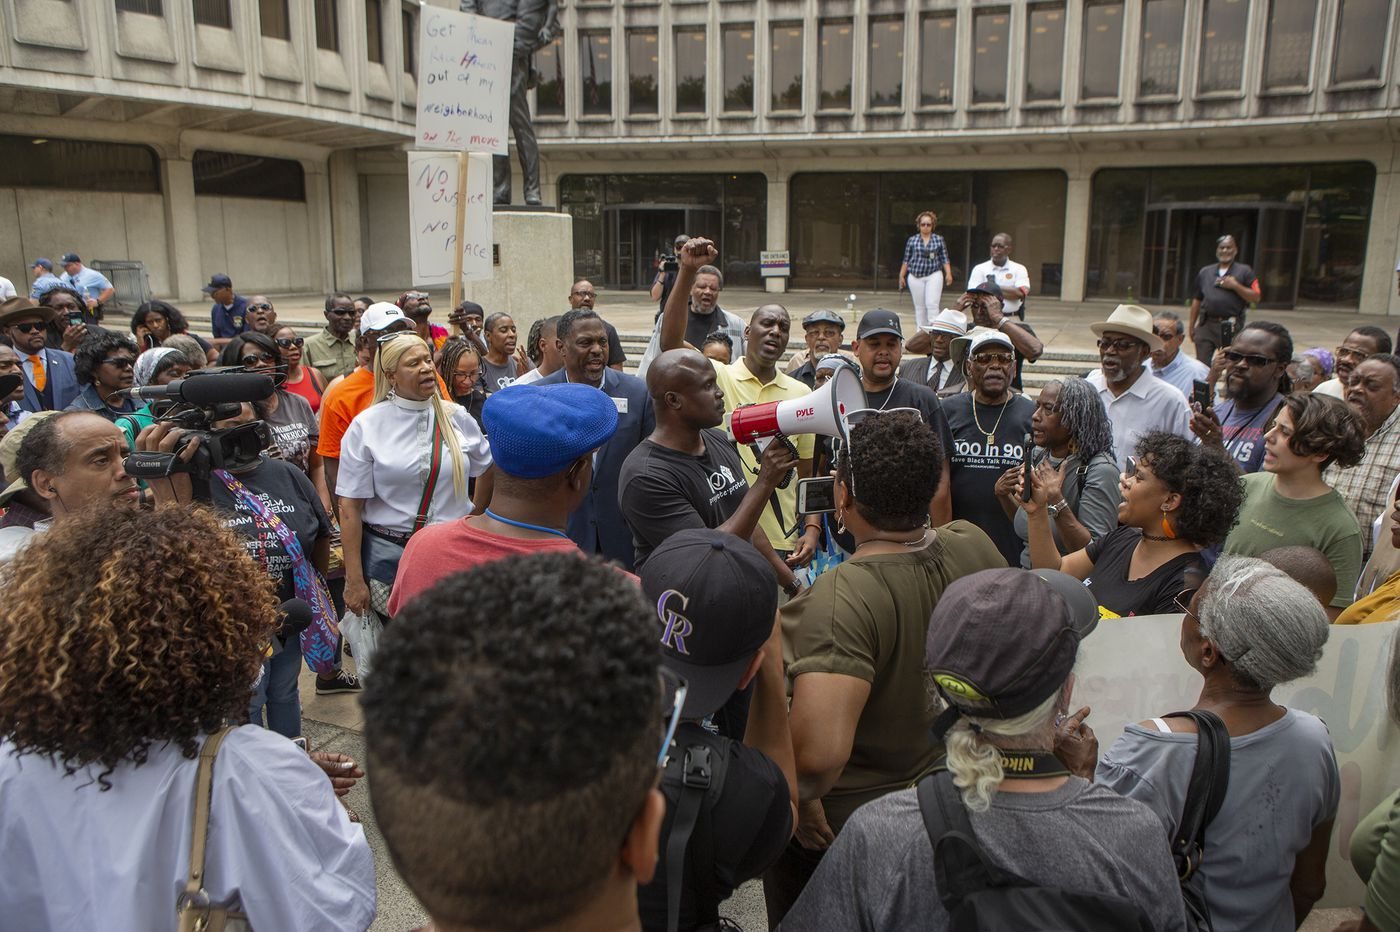 After racist Facebook posts, what should happen next for Philly police? | Solomon Jones